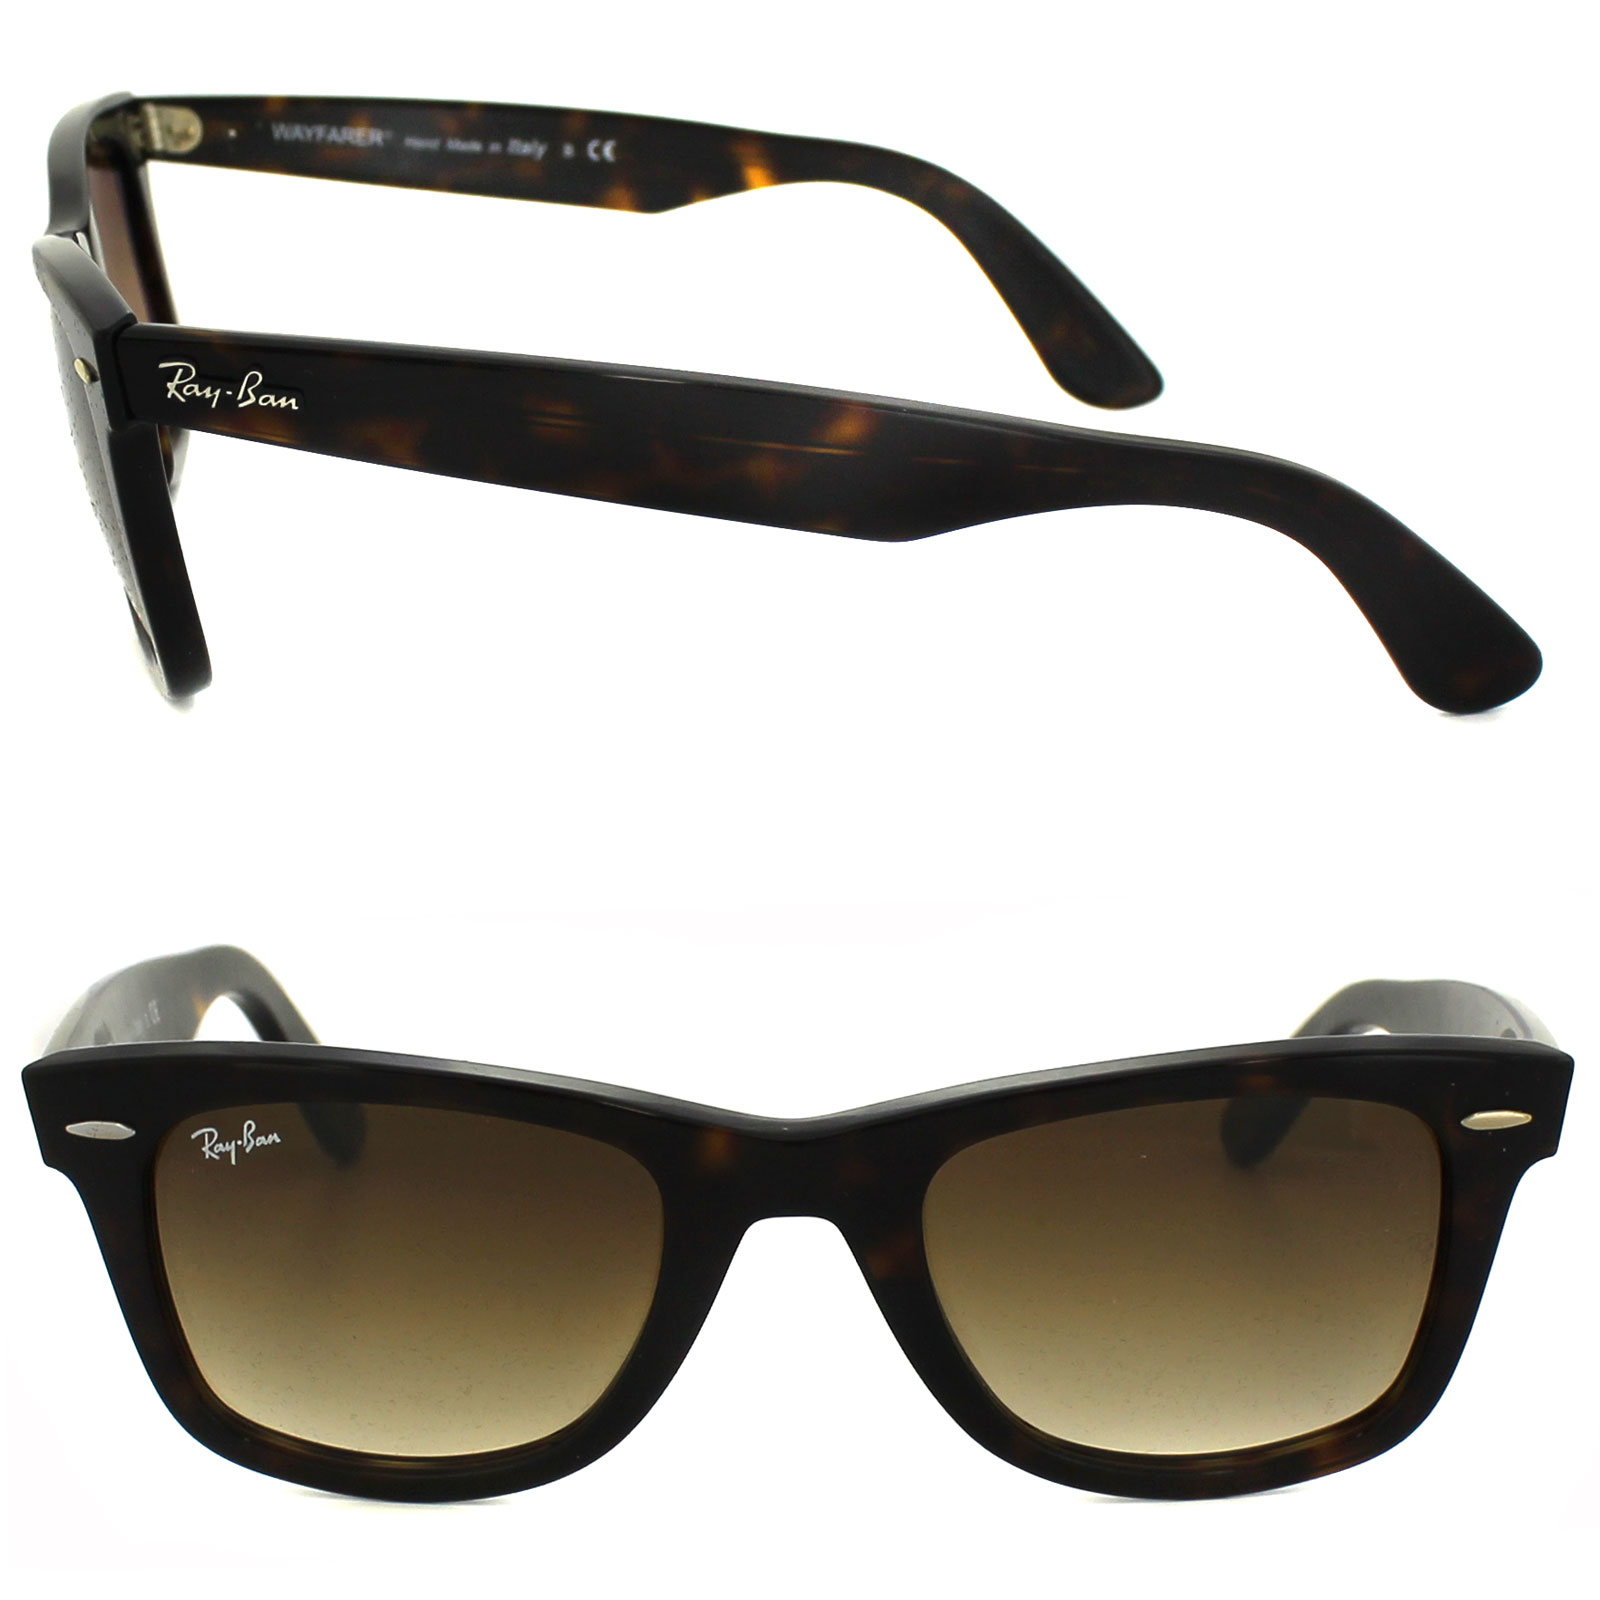 Sentinel Ray-Ban Sunglasses Wayfarer 2140 902 51 Havana Brown Gradient  Medium 50mm 0c7eb93f61e0